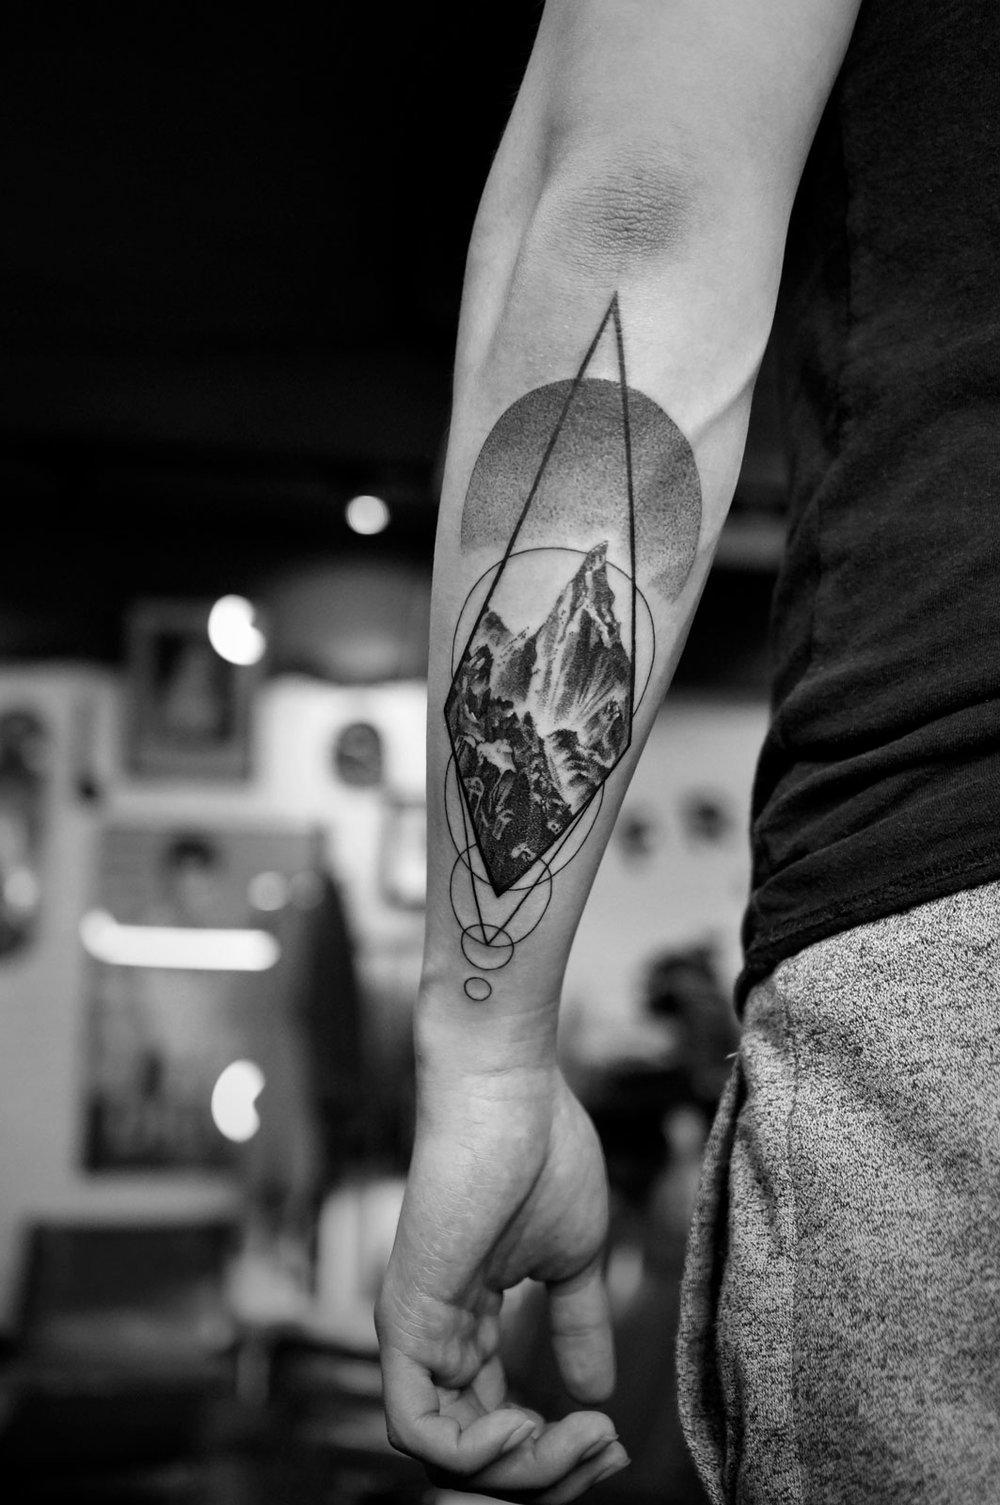 2018-fridays-tattoo-hong-kong-felix-sunrise-geometry-illustration.jpg